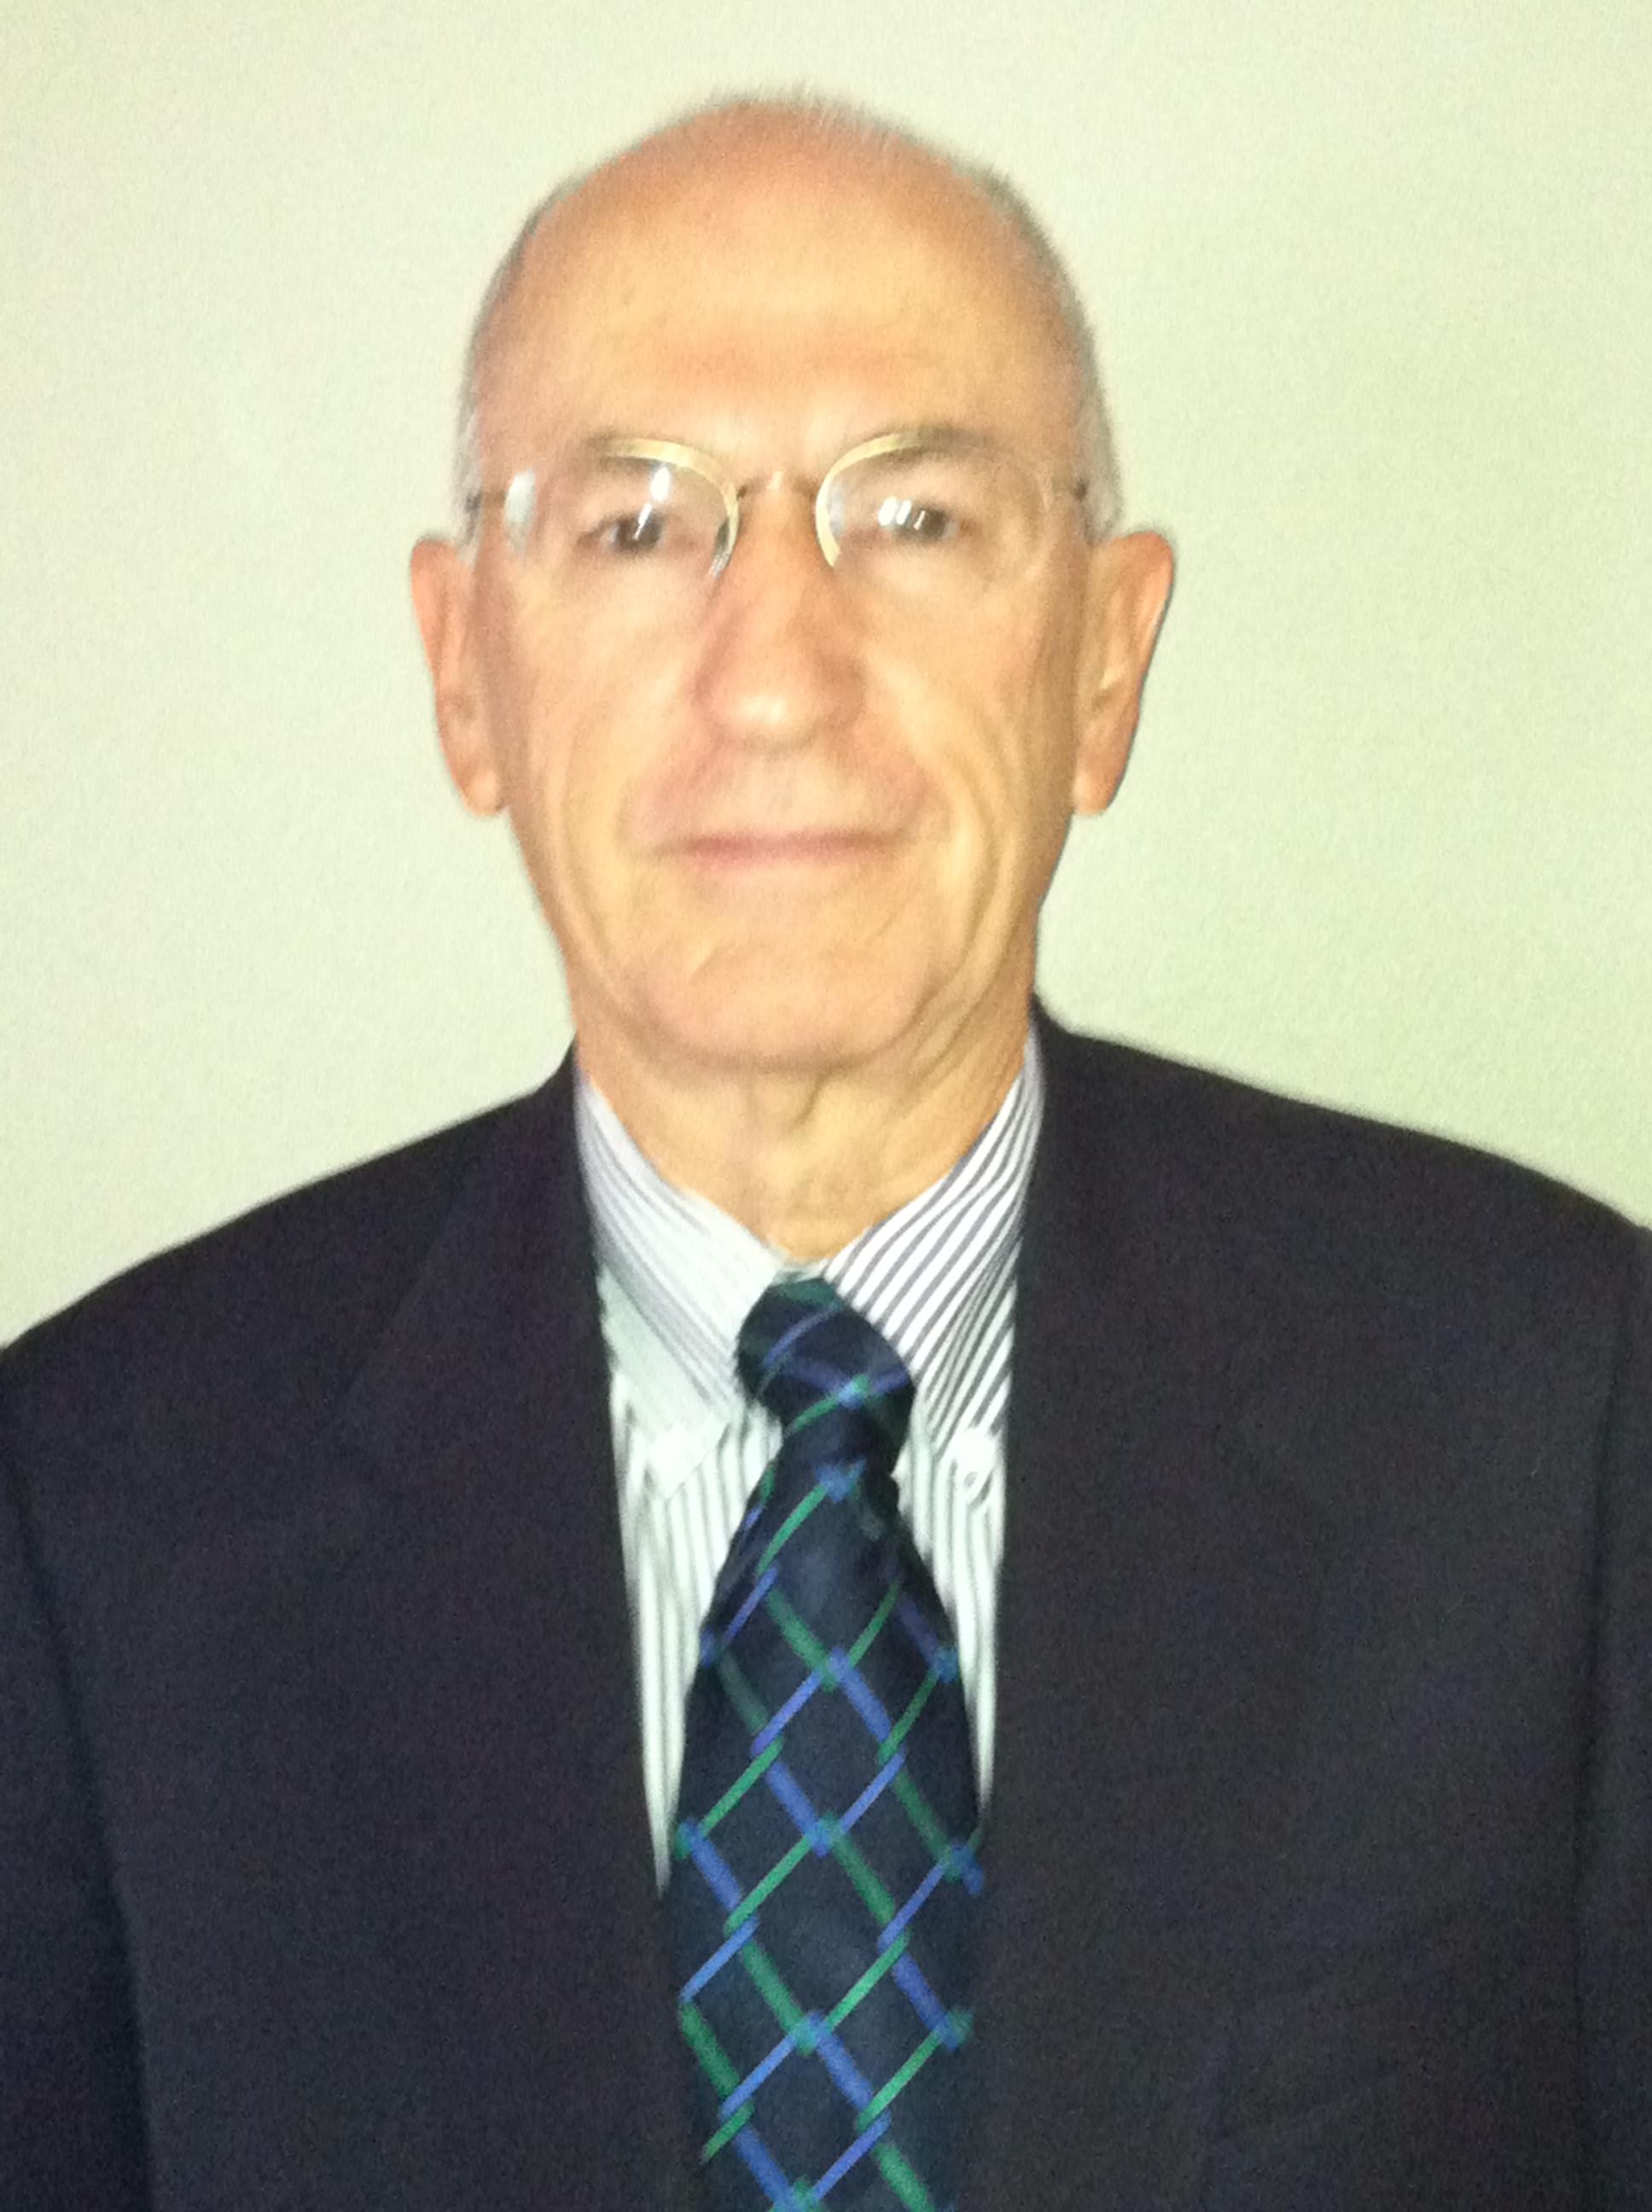 Richard Stout